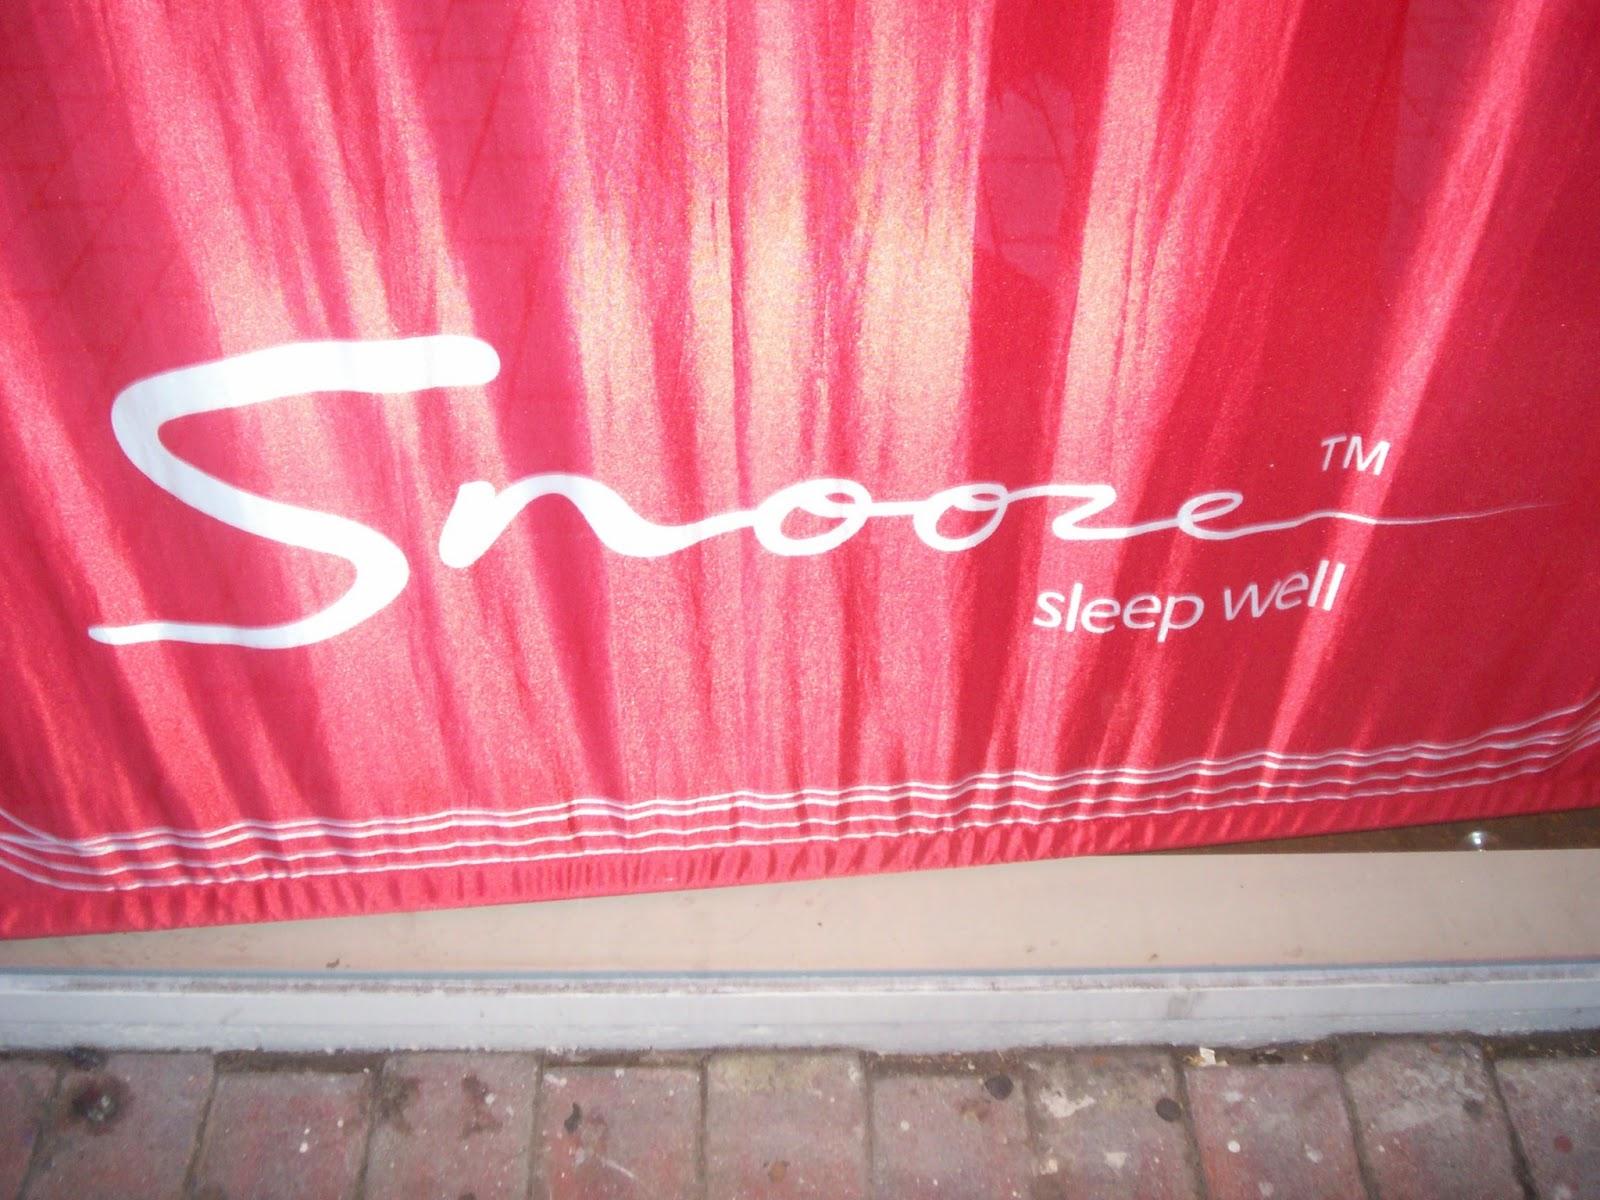 Furniture advertising slogans - Beds And Bedroom Furniture